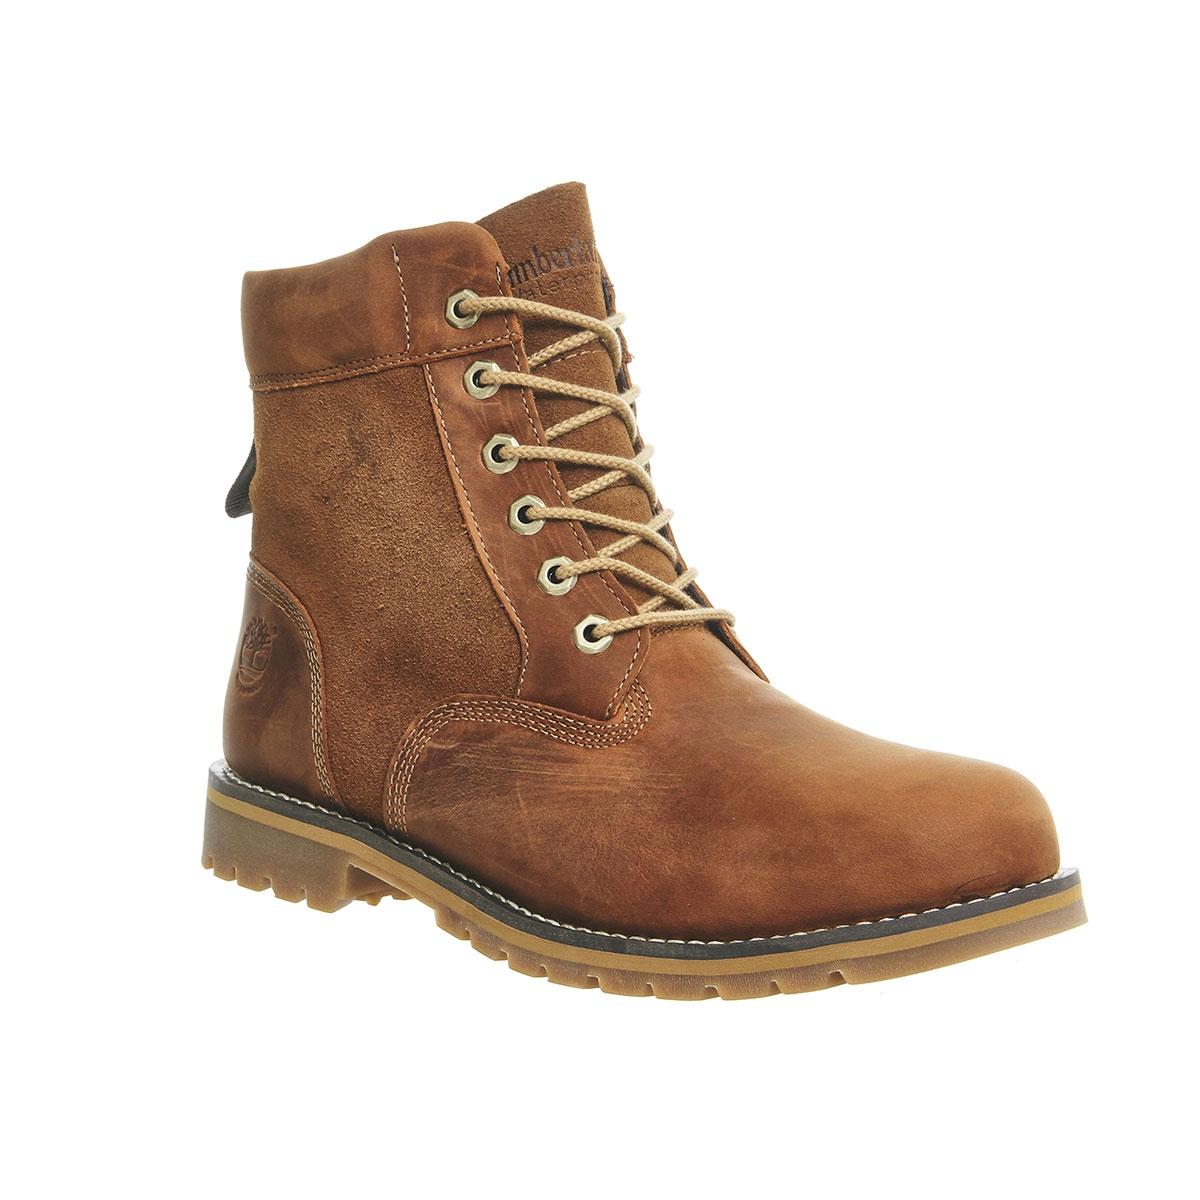 9628866e358 Timberland Larchmont 6 Inch WP Boots (Men's) - Glazed Ginger (Medium Brown)  Full Grain